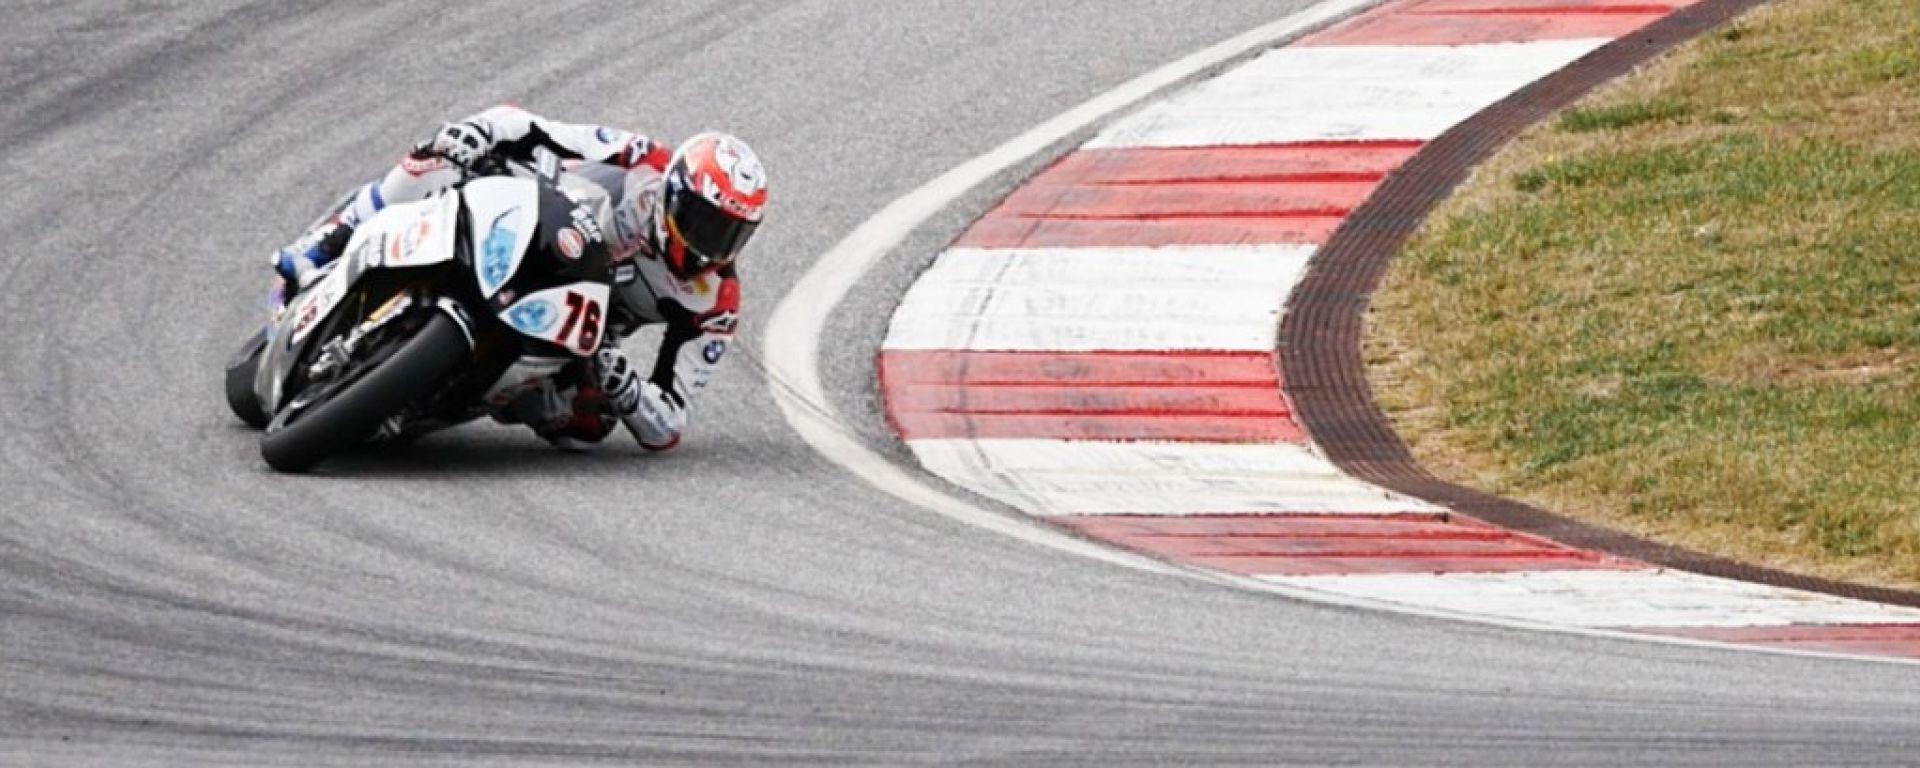 Gulf Althea BMW Racing Team